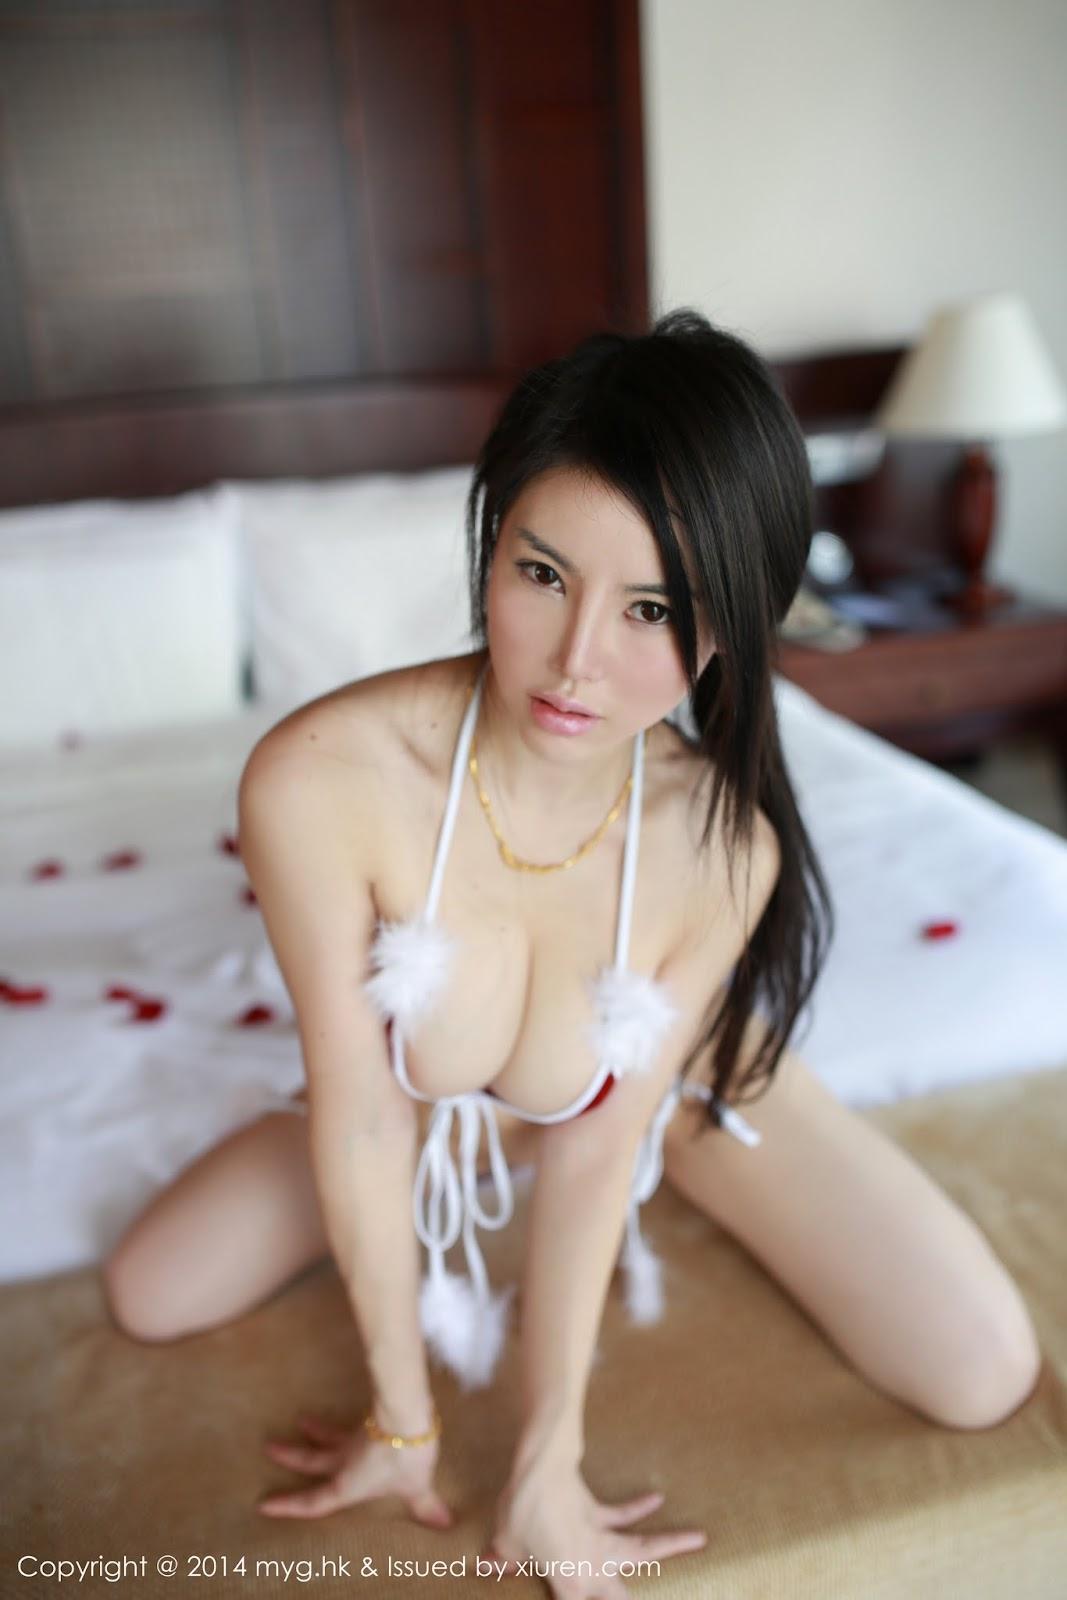 30020 041 - MYGIRL VOL.30 Photo Nude Hot Sexy